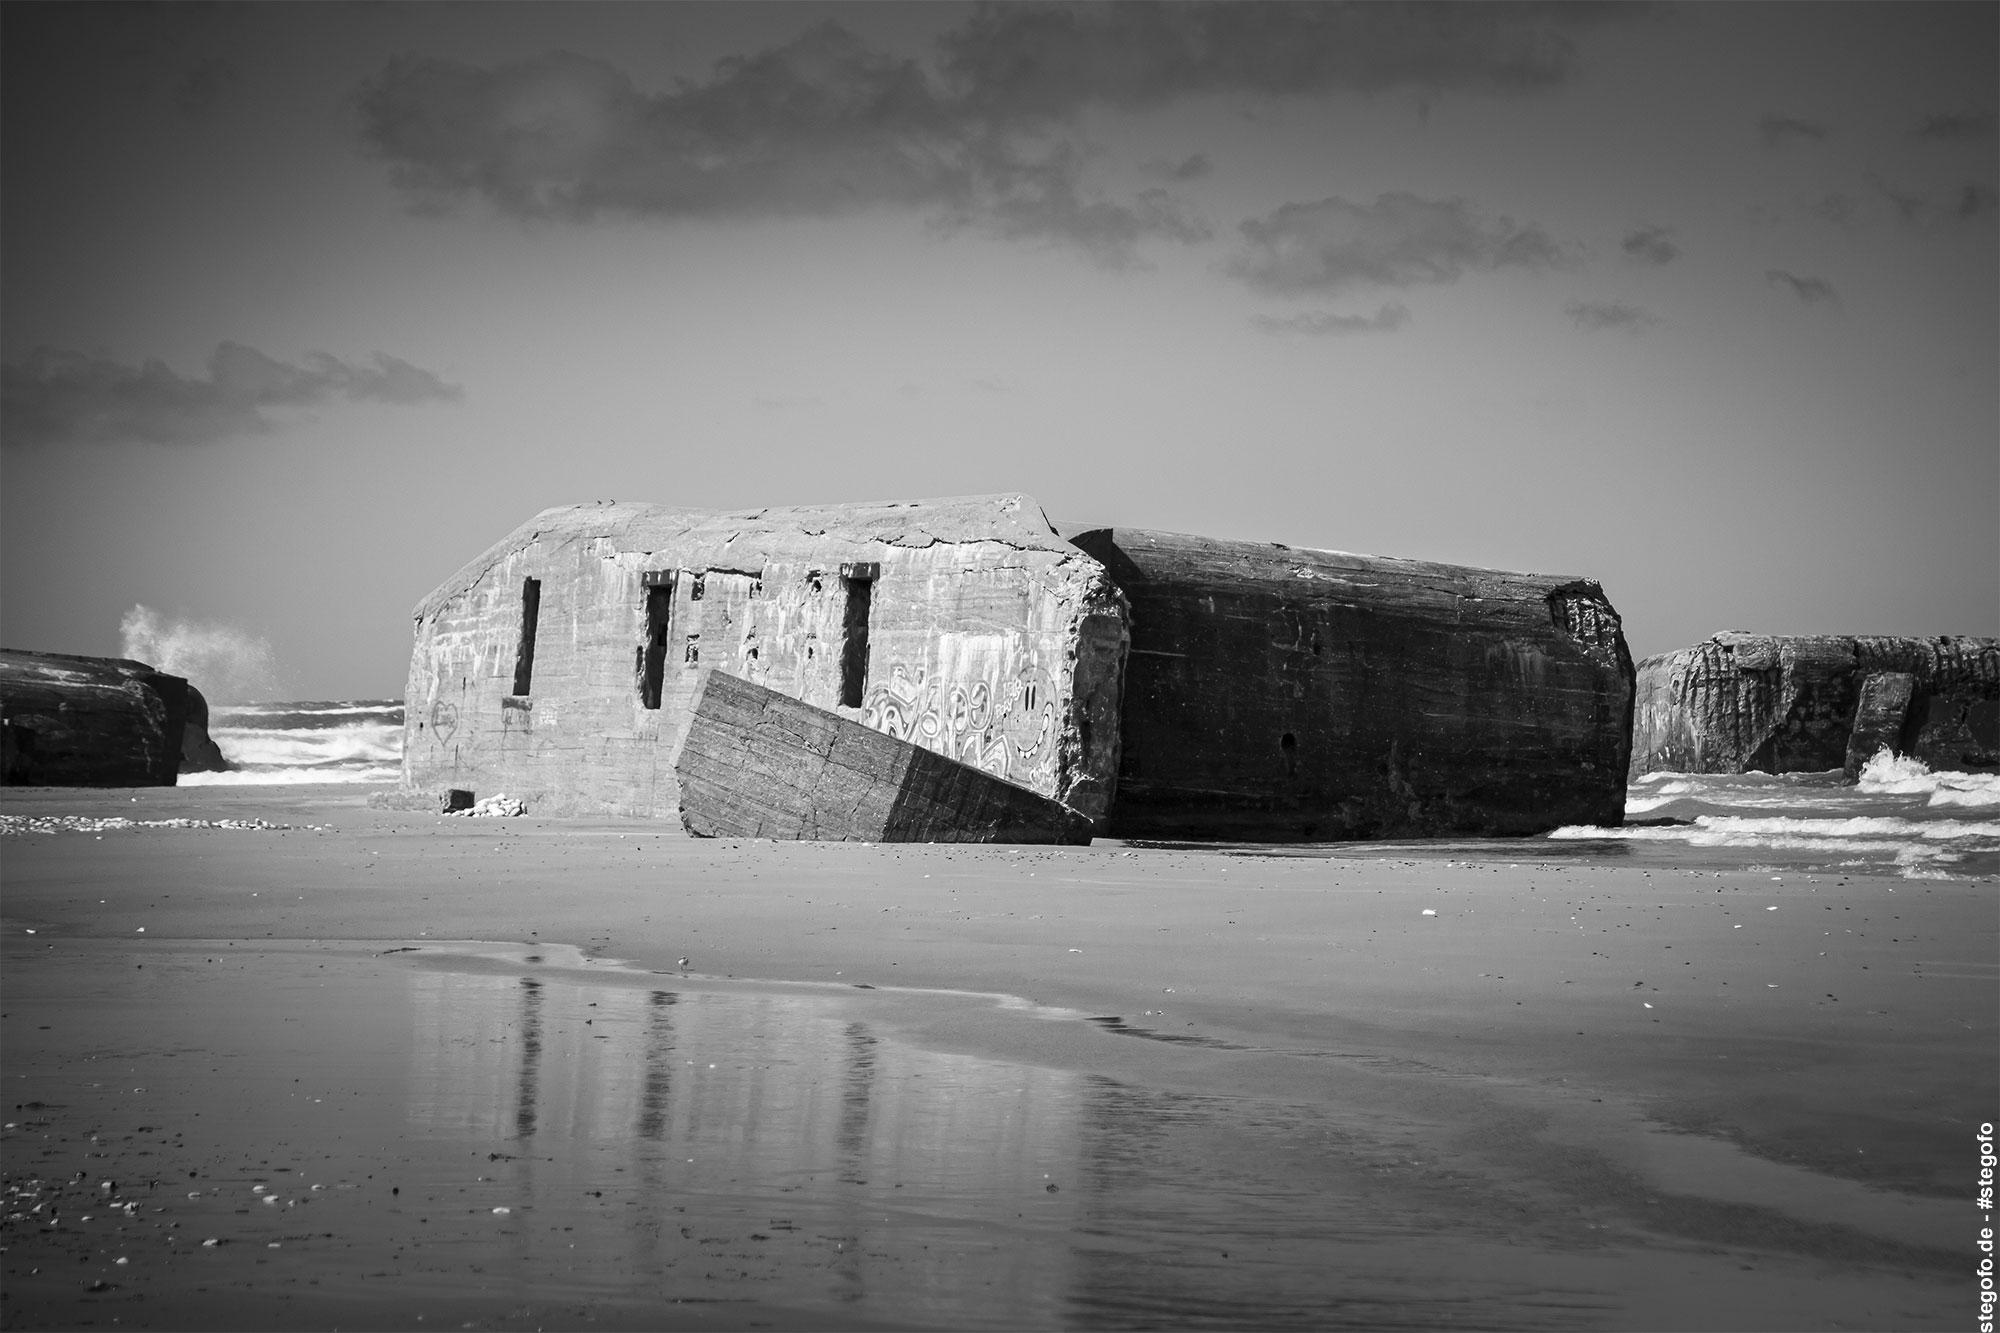 Die zerstörten Bunker